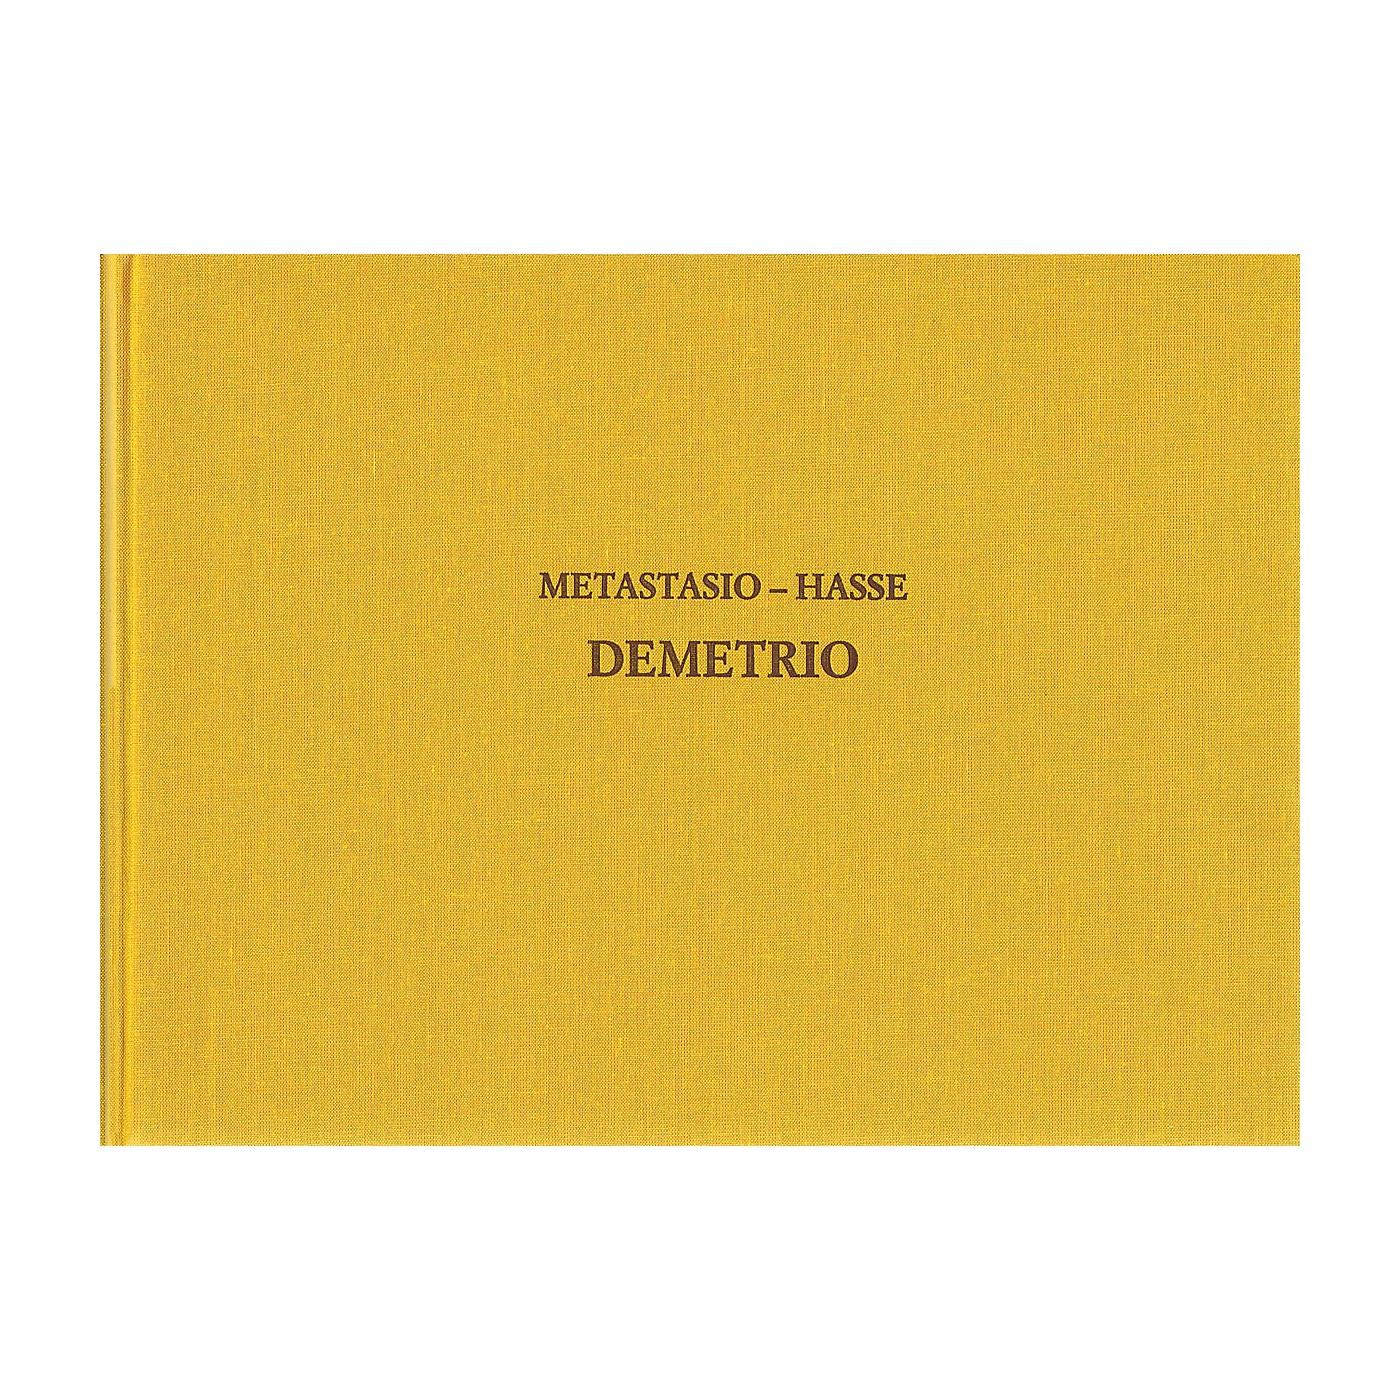 Ricordi Demetrio - Drammaturgia Musicale Veneta 17 CRITICAL EDITIONS Hardcover by Hasse Edited by Reinhard Strohm thumbnail